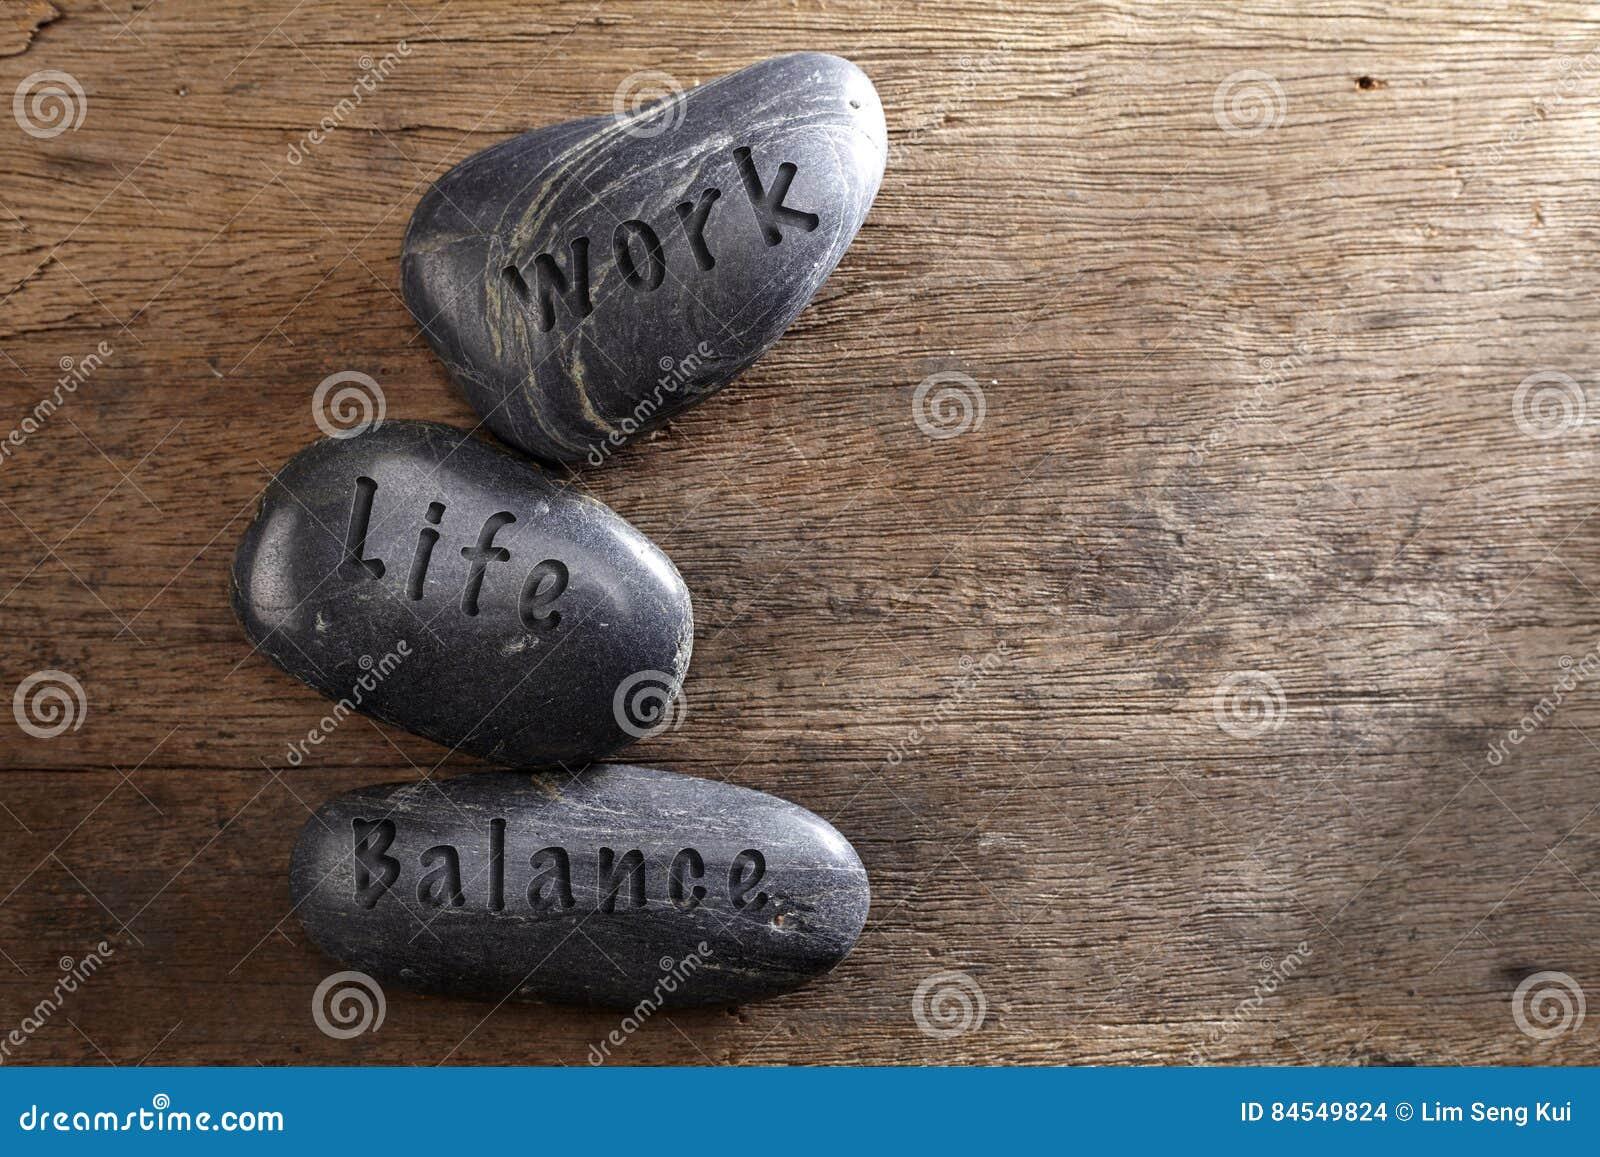 e48f95556d9 Work life balance stock photo. Image of pleasure, career - 84549824